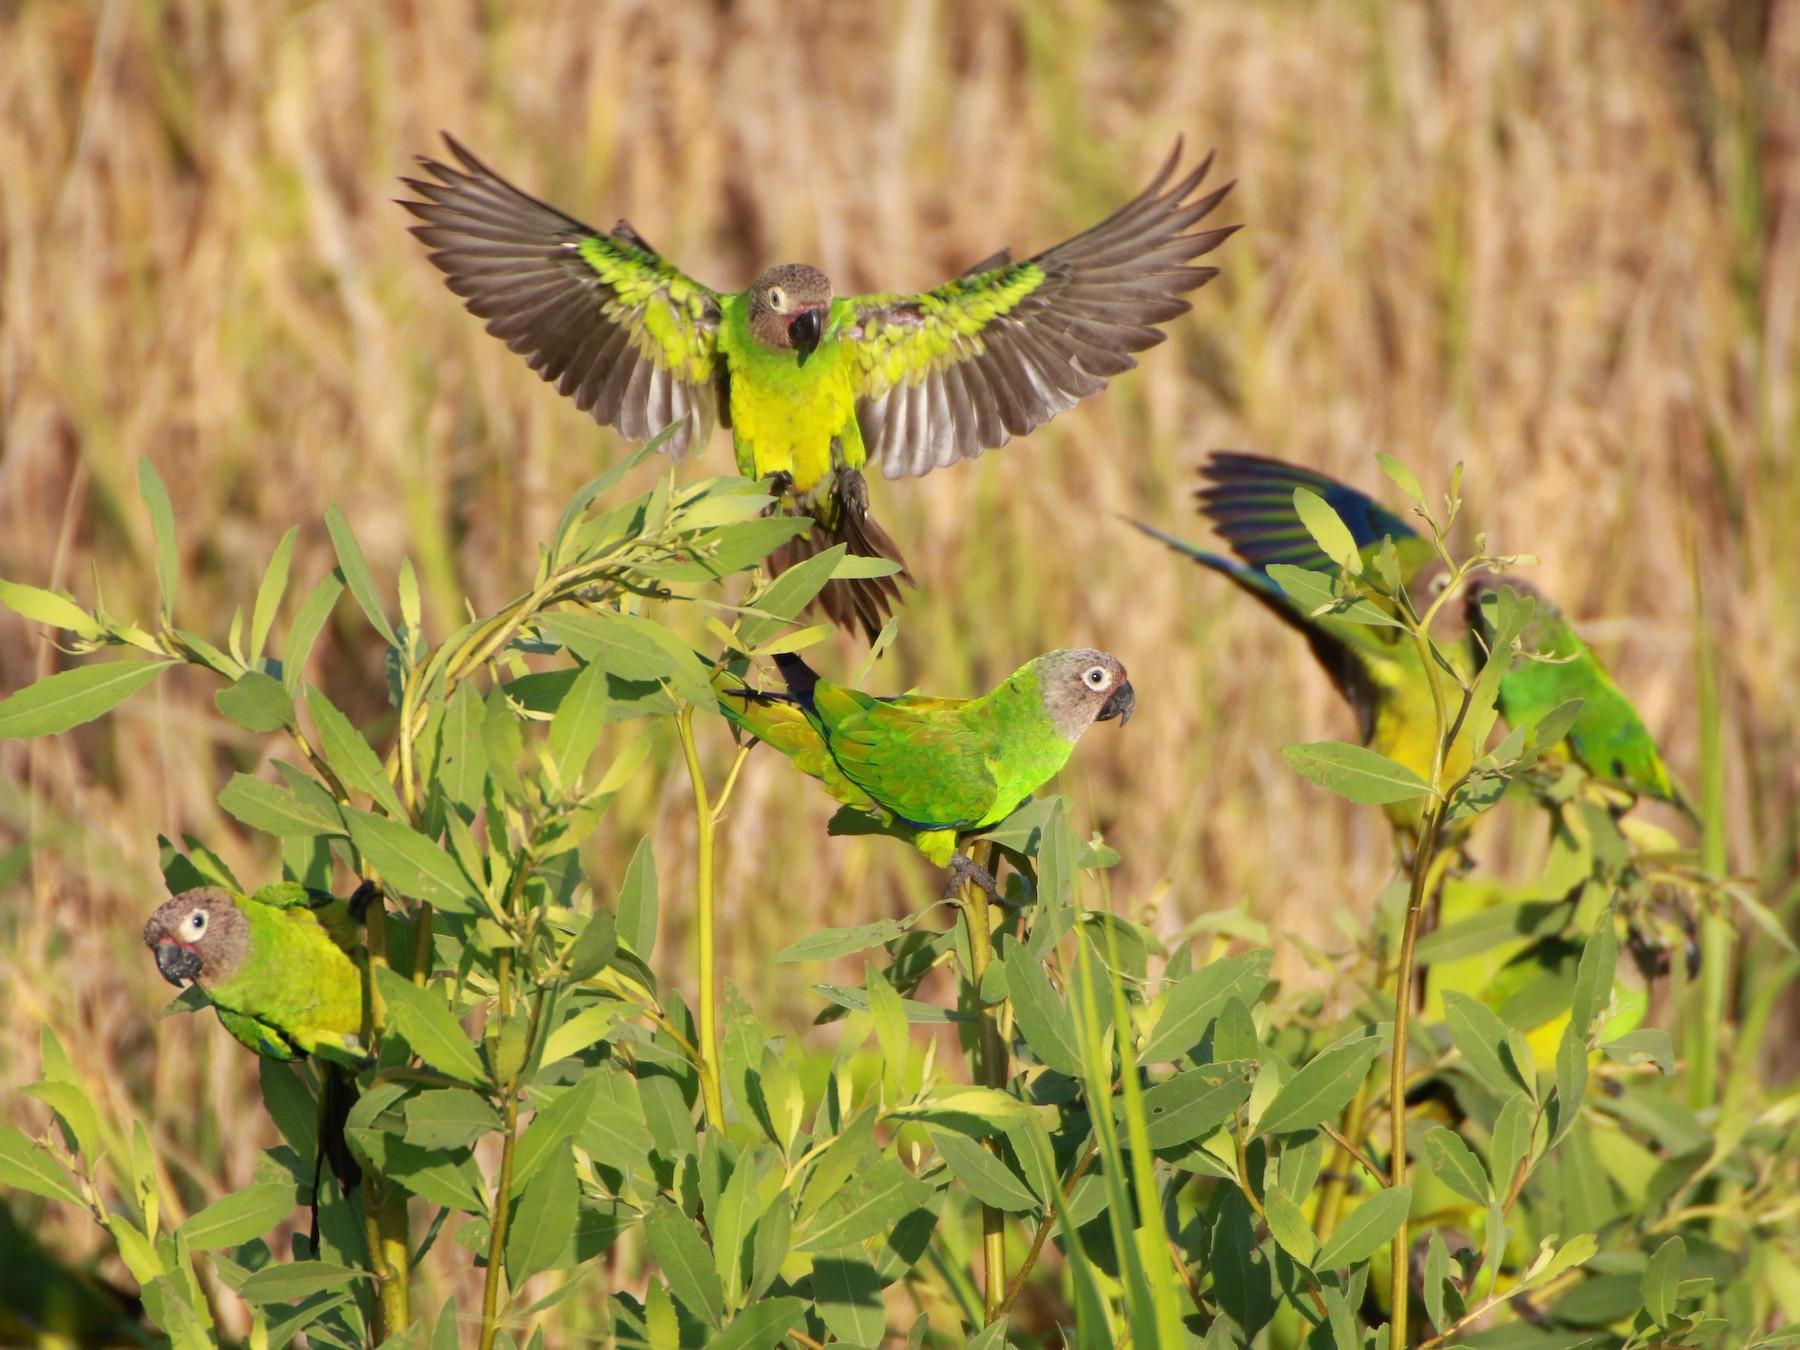 Dusky-headed Parakeet - Jose Luis Lescano Perez Pacheco